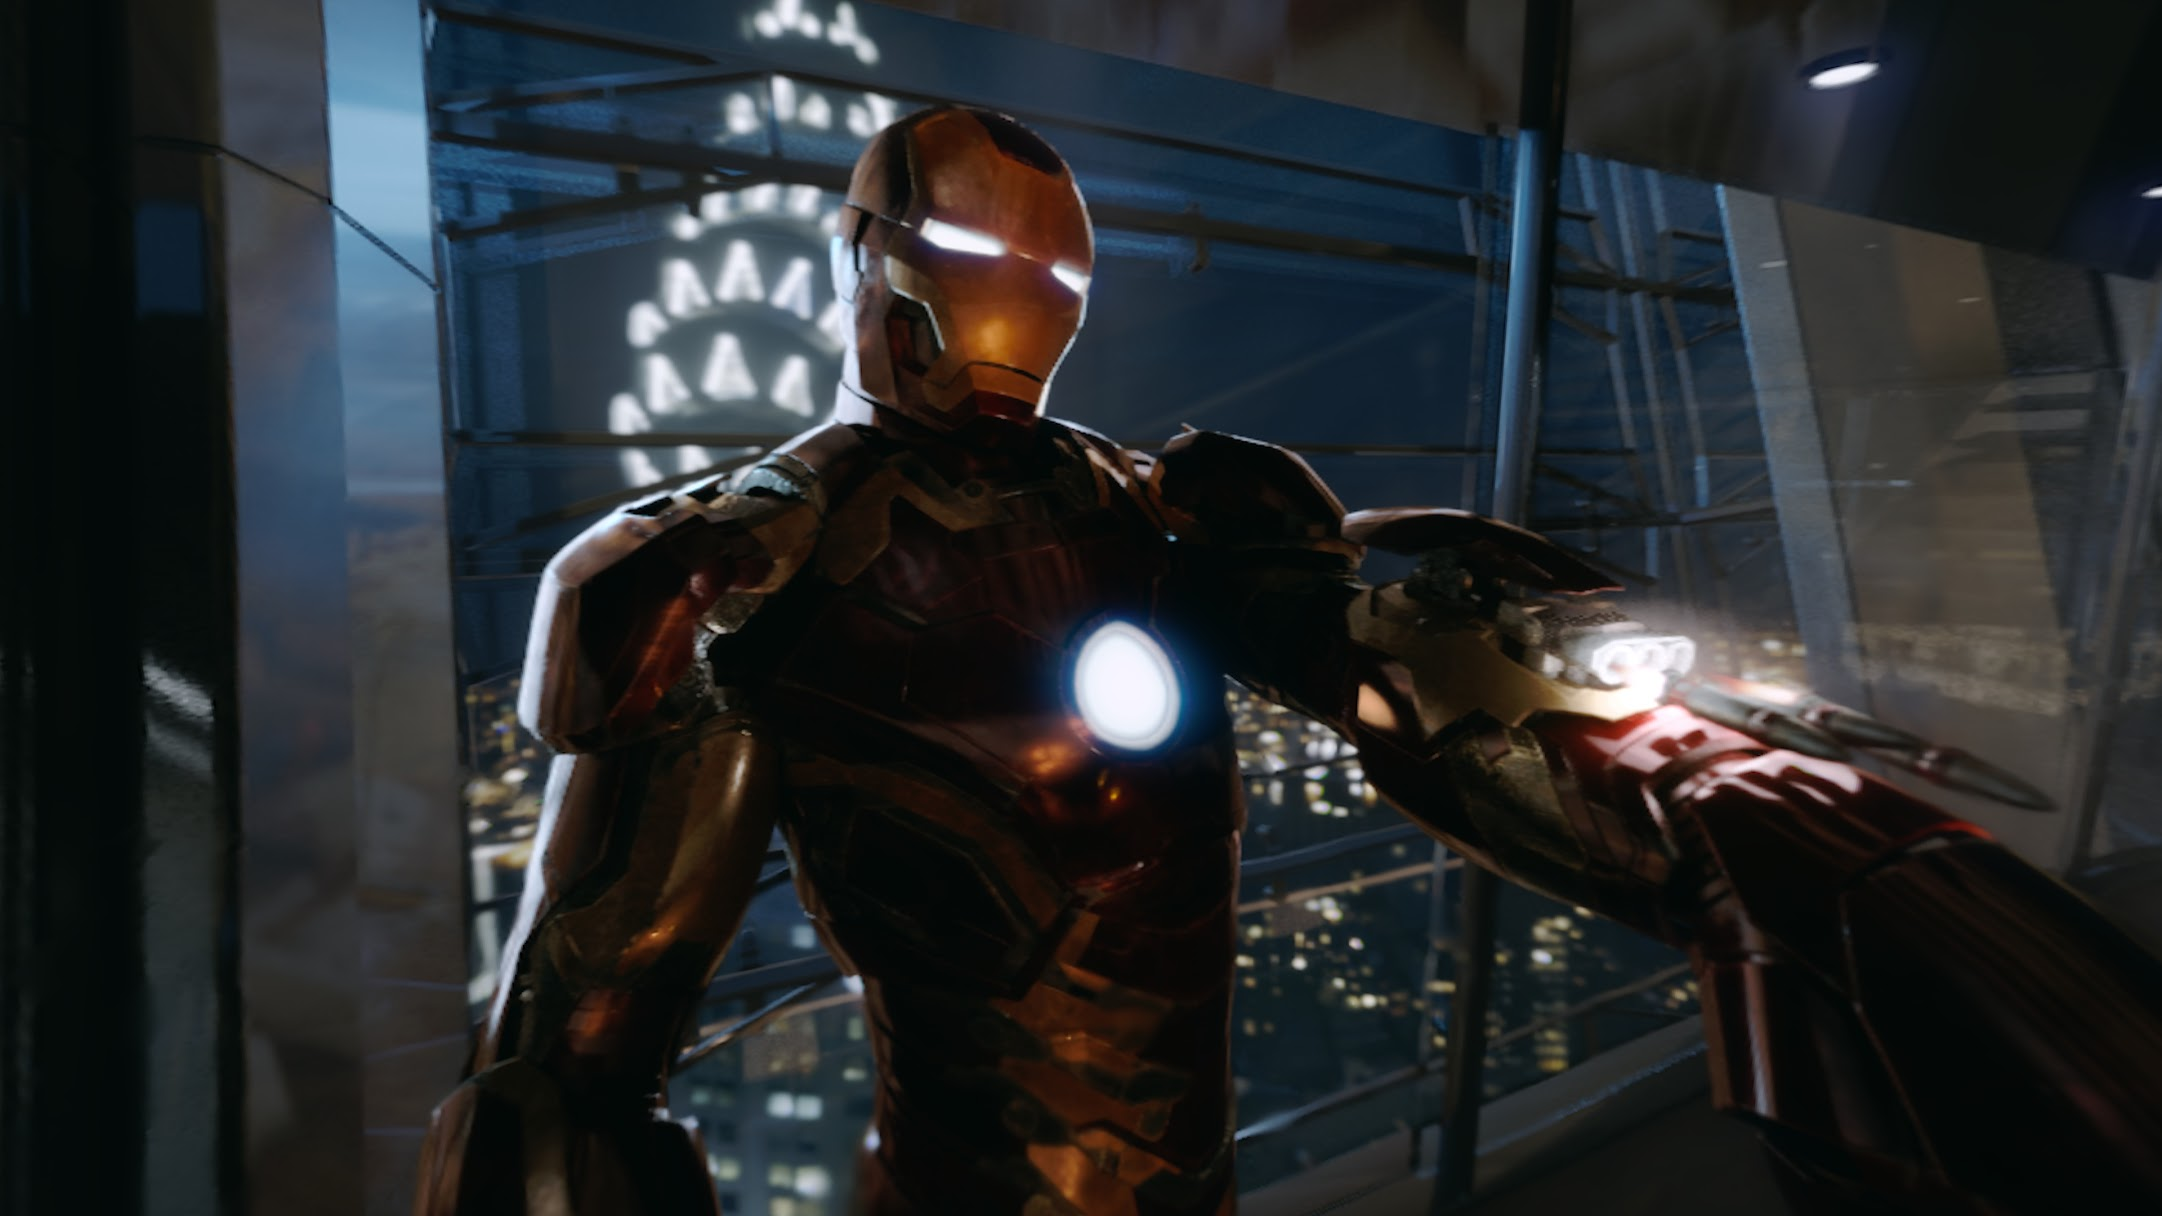 Avengers Age of Ultron Helmet Avengers Age of Ultron Goes